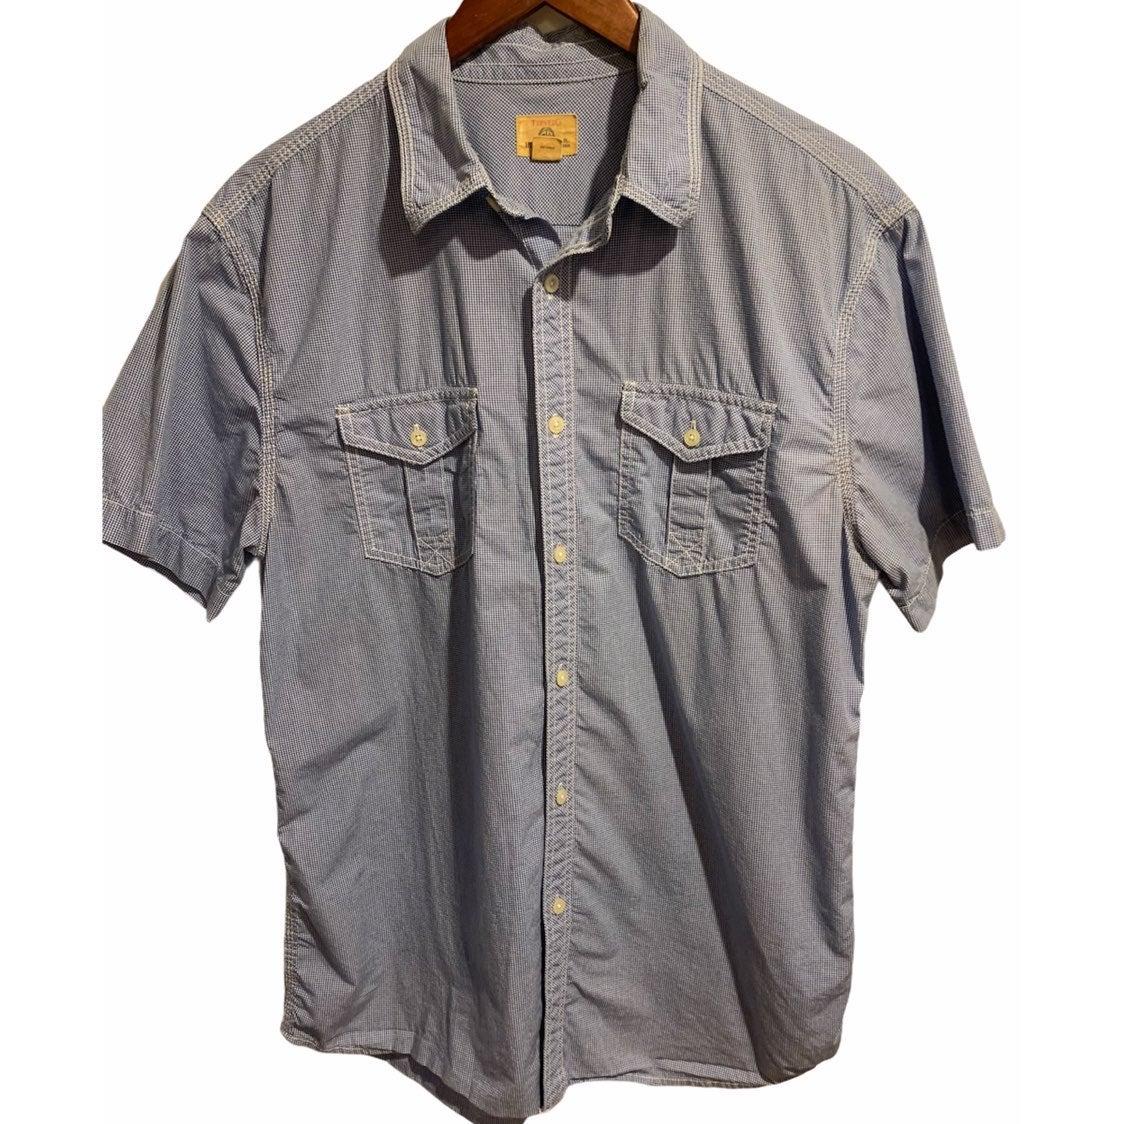 Trevero Button down shirt size L